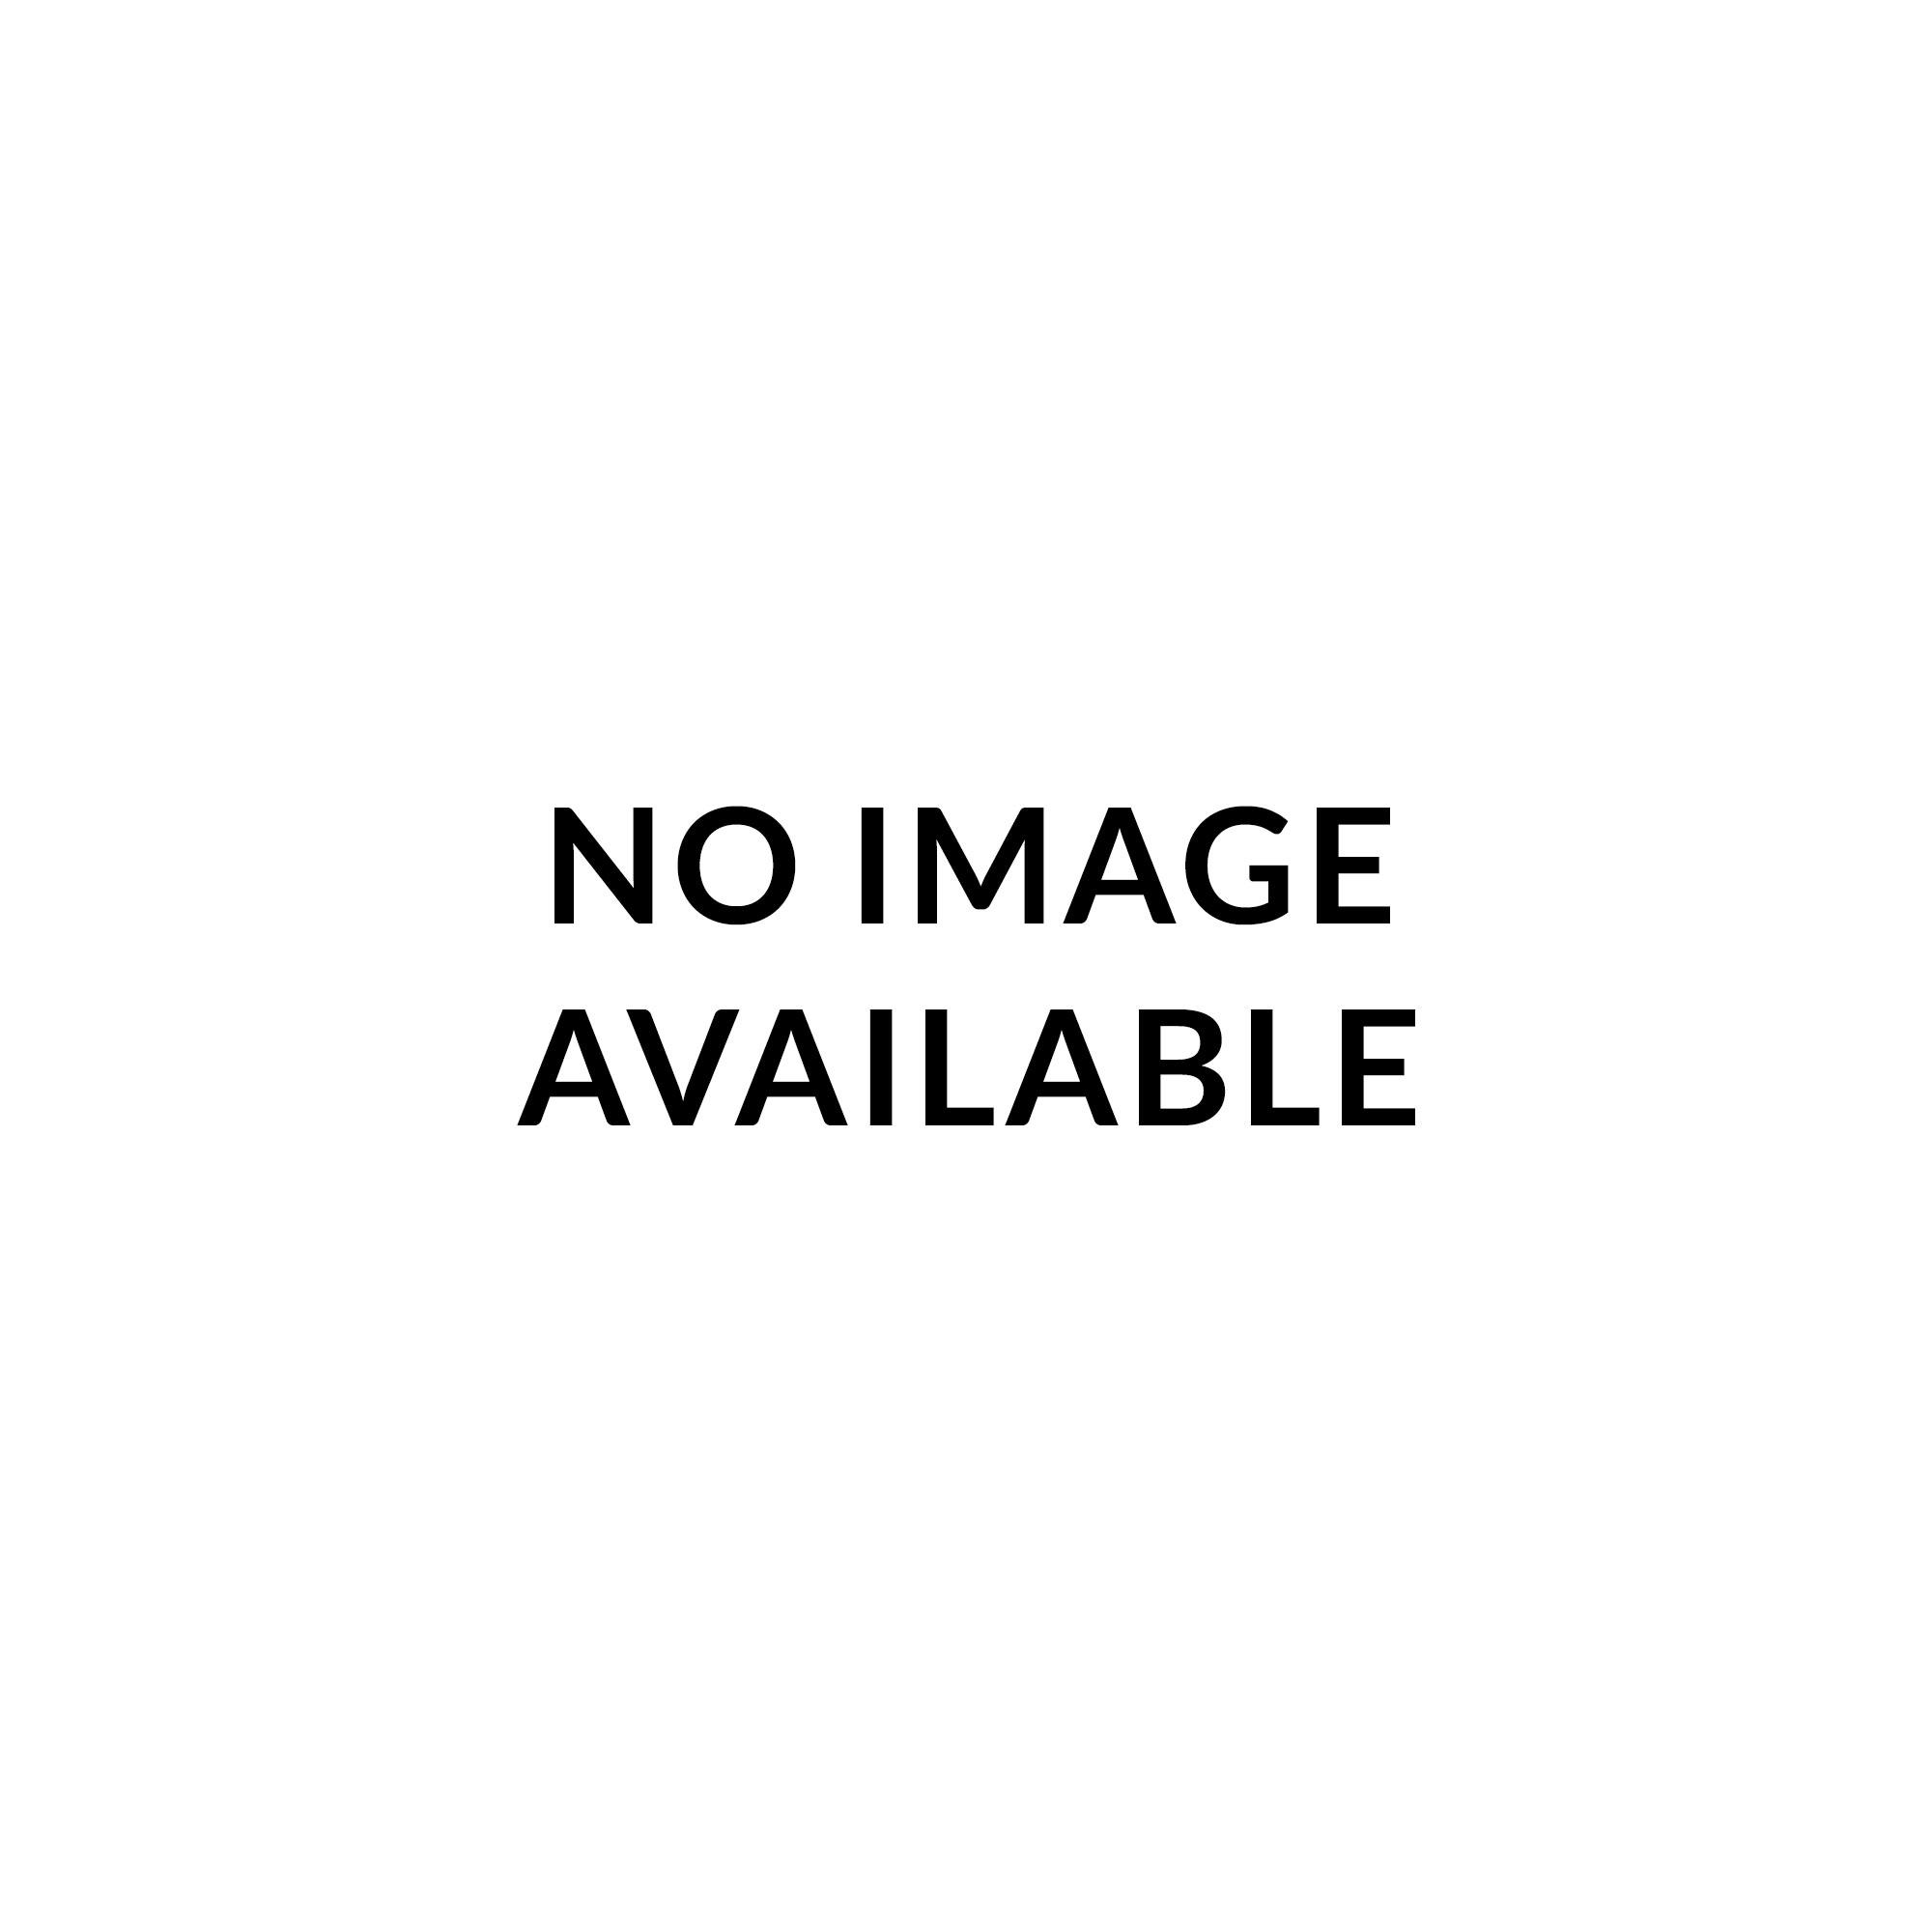 Seymour Duncan SHPR-1n P-Rails Humbucker, Neck, Black